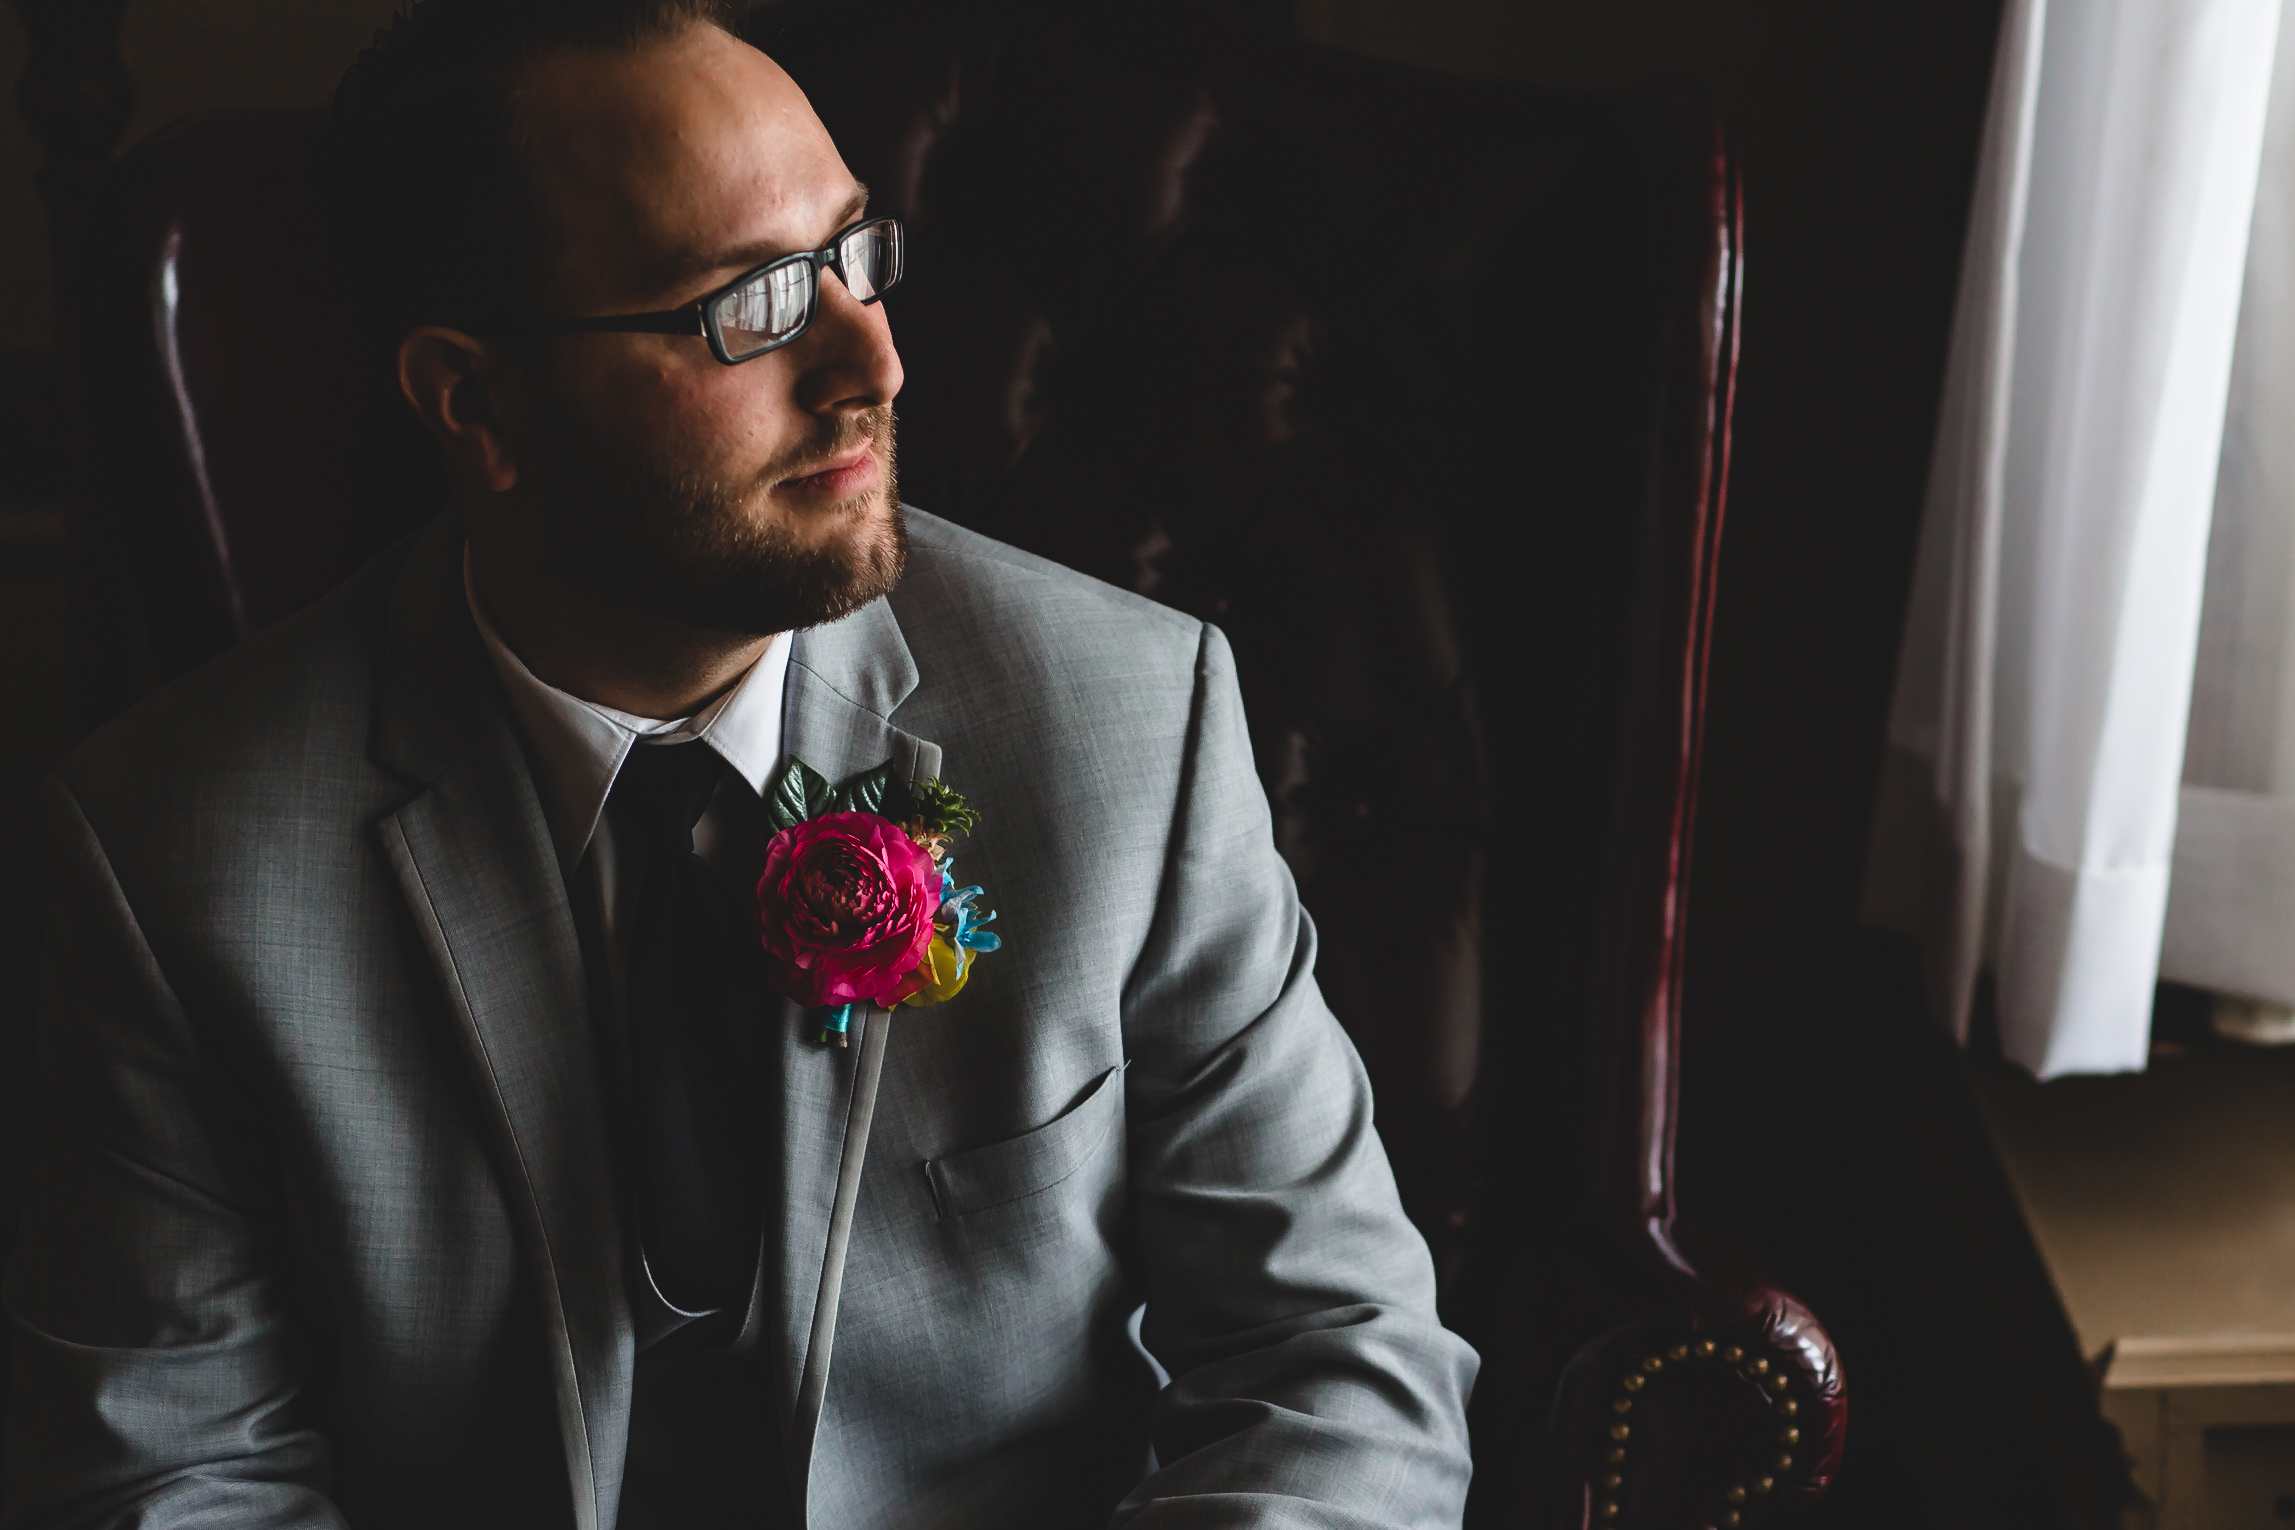 daniel_nydick_nj_photographer_headshot_wedding_event_family-3.jpg